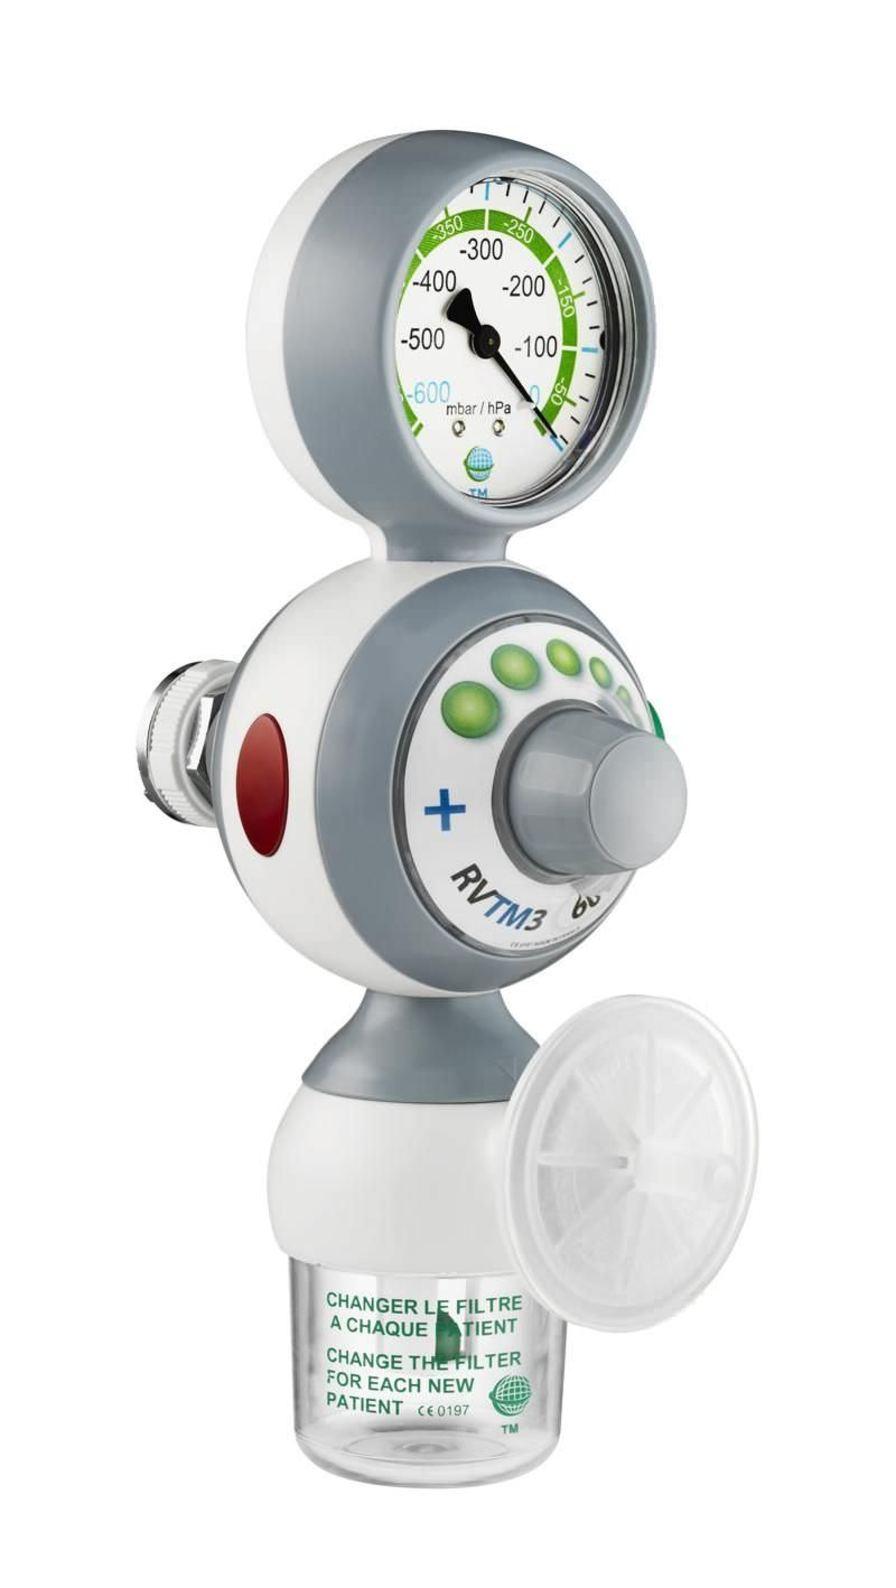 Vacuum regulator / plug-in type 0 - 1 000 mbar | RVTM3 Technologie Medicale